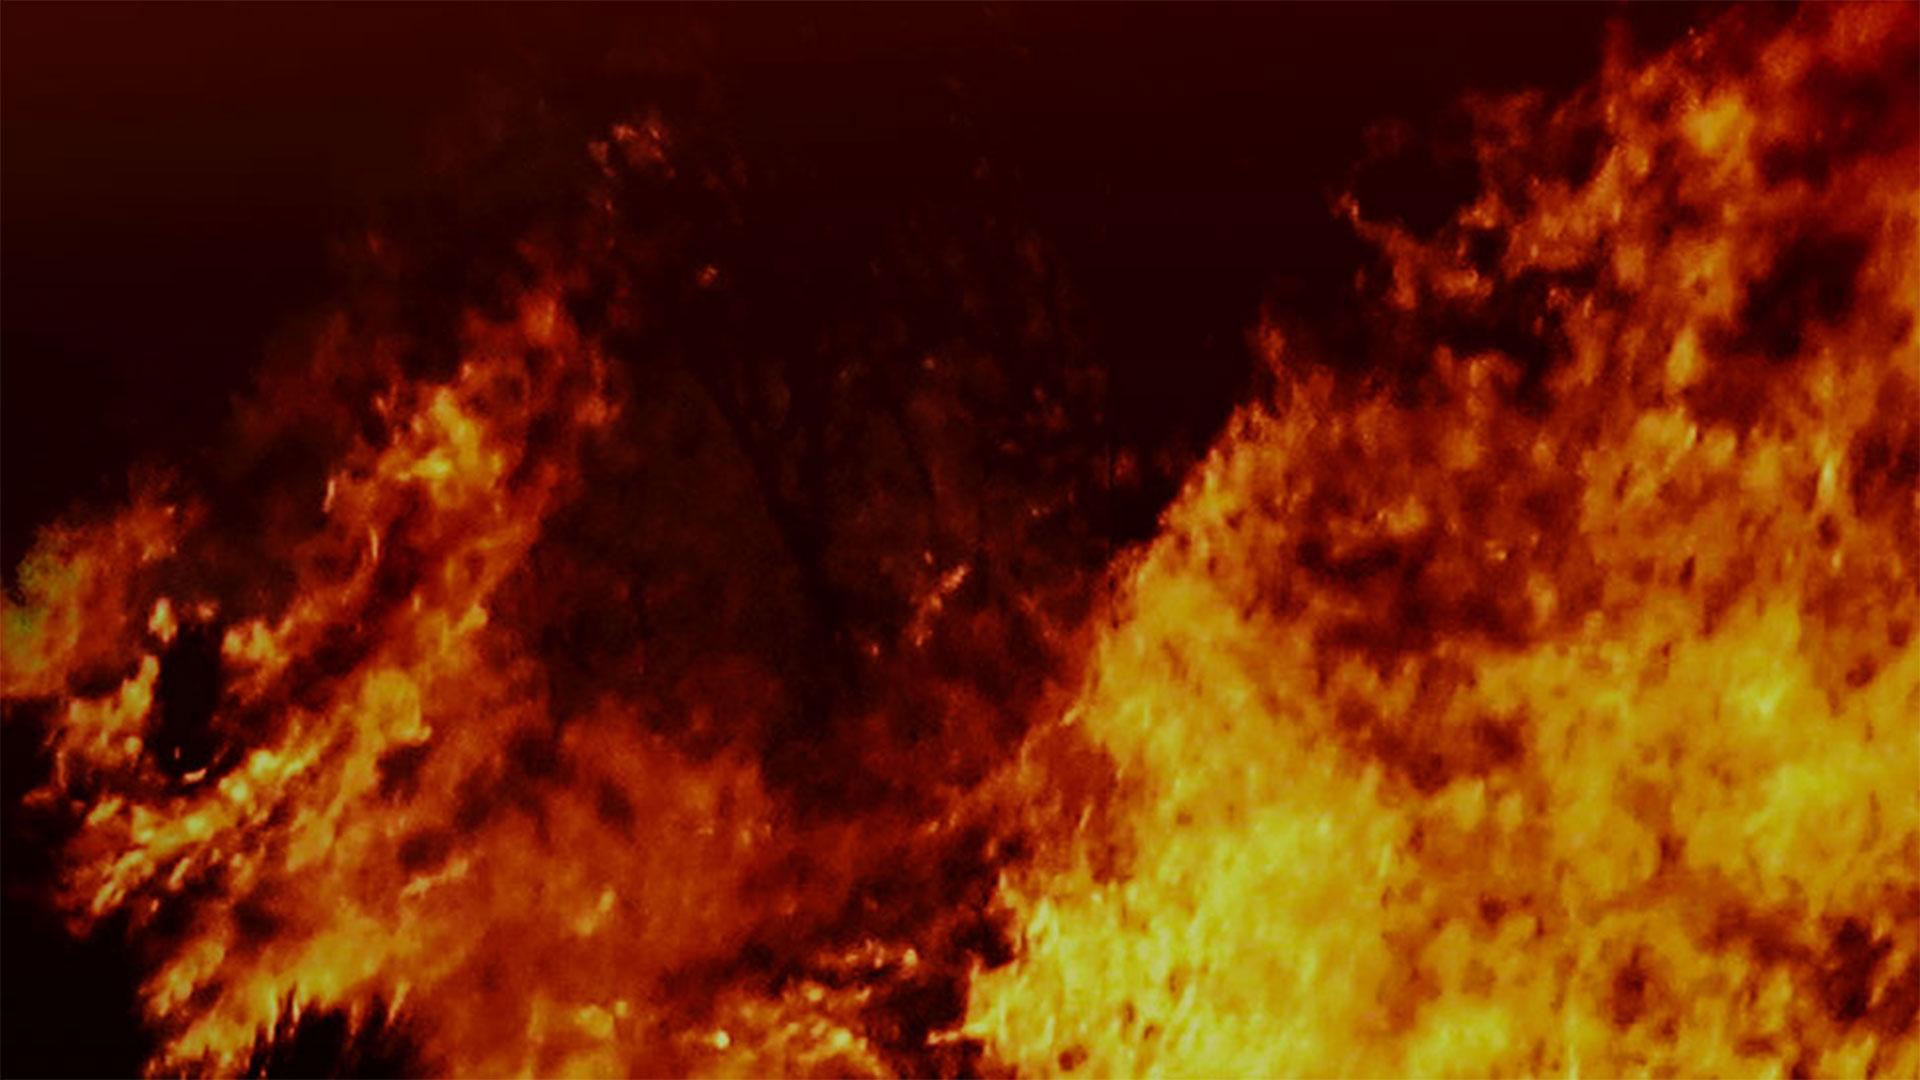 KELO fire flames generic